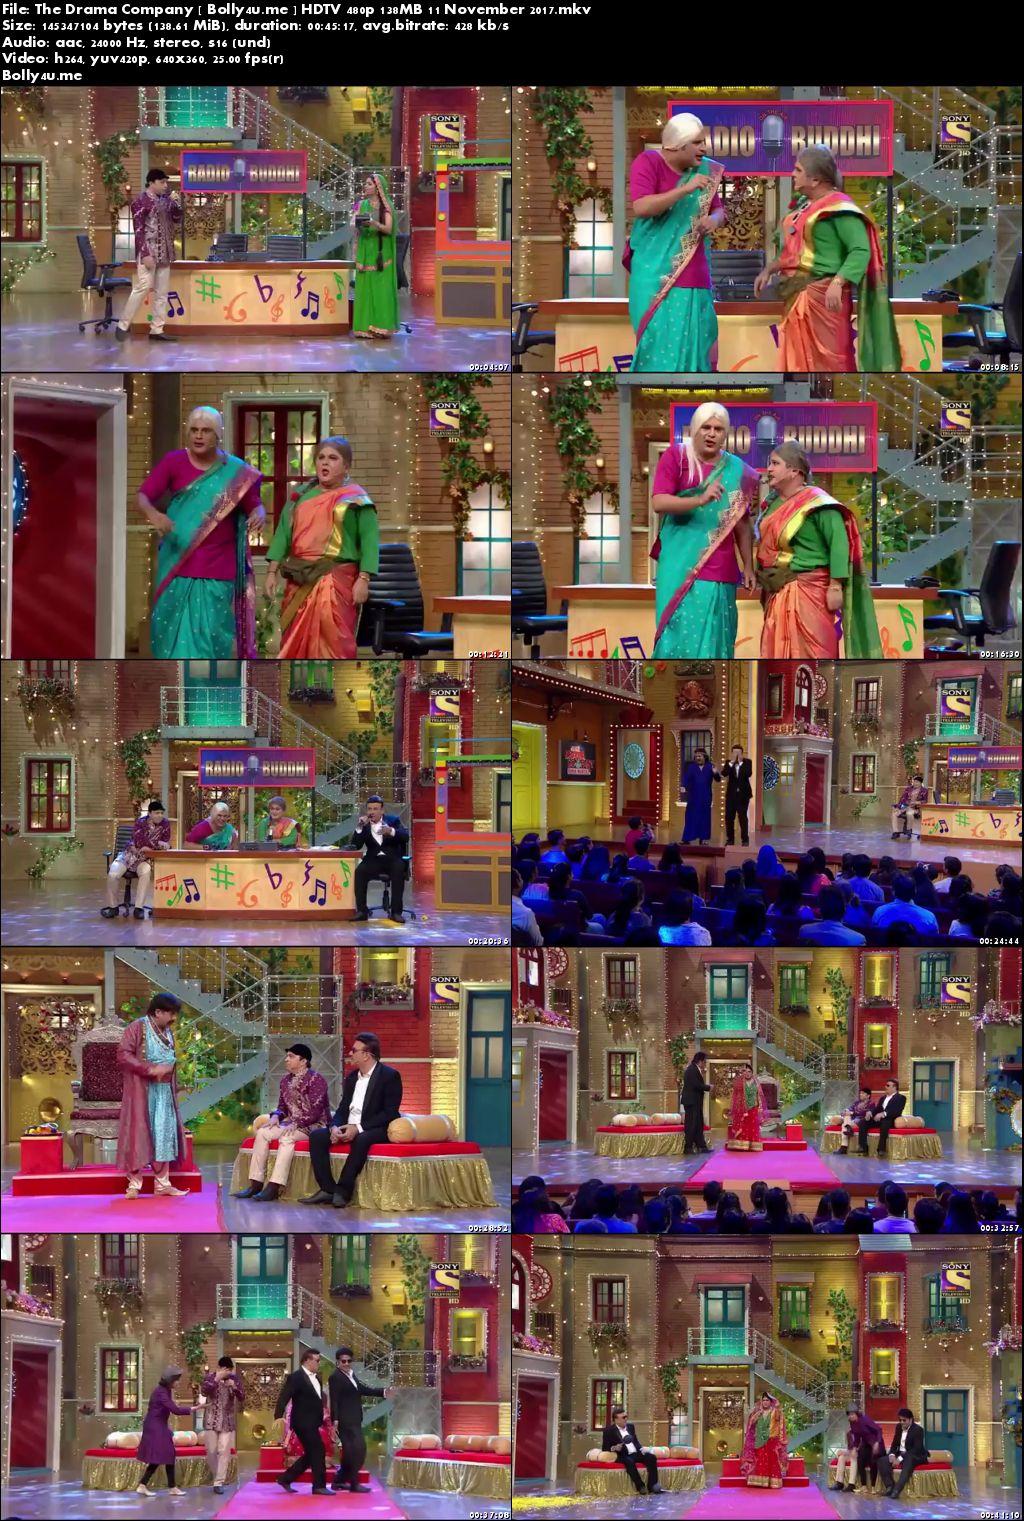 The Drama Company HDTV 480p 140MB 11 November 2017 Download